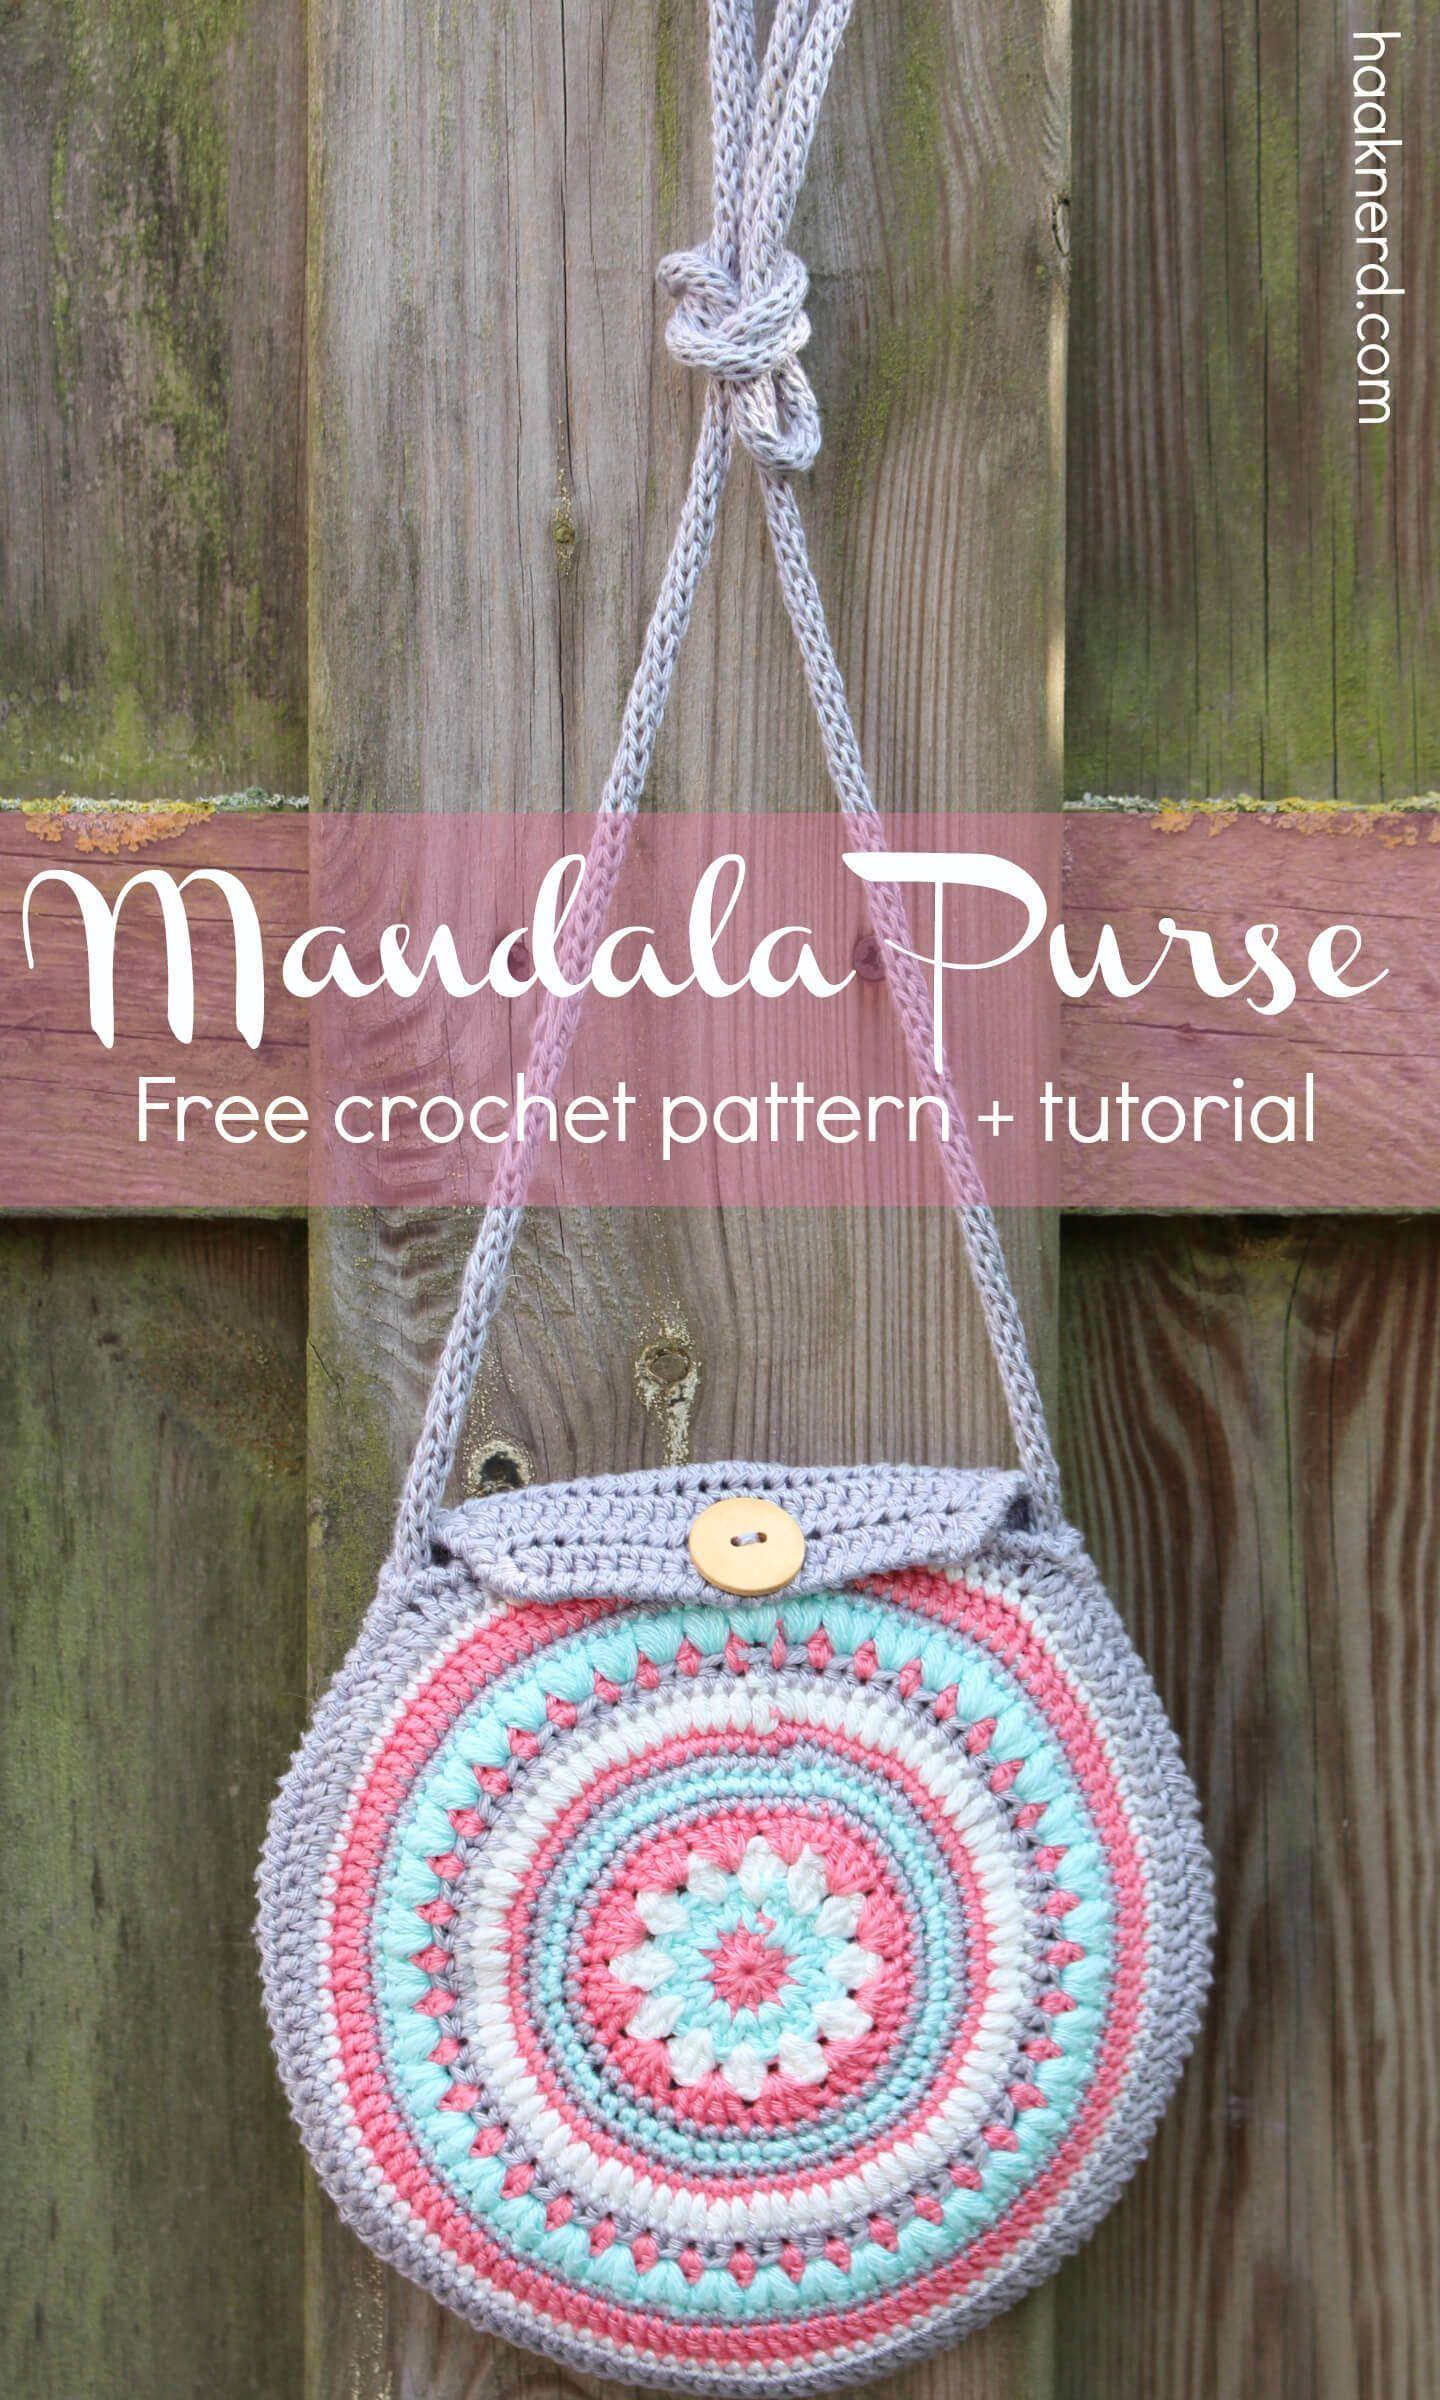 Mandala Purse | Pinterest | Häkeltasche, gehäkelte Geldbörsen und Häkeln